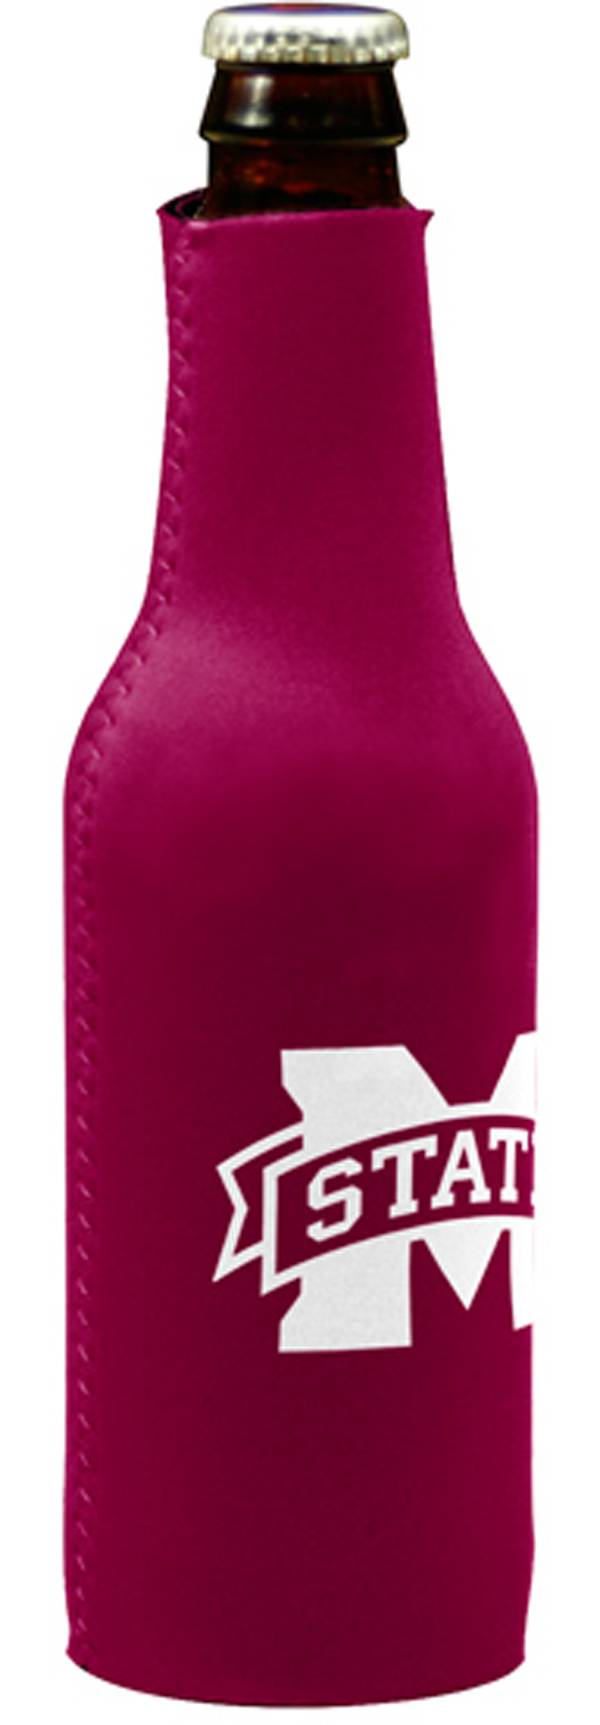 Mississippi State Bulldogs Bottle Koozie product image